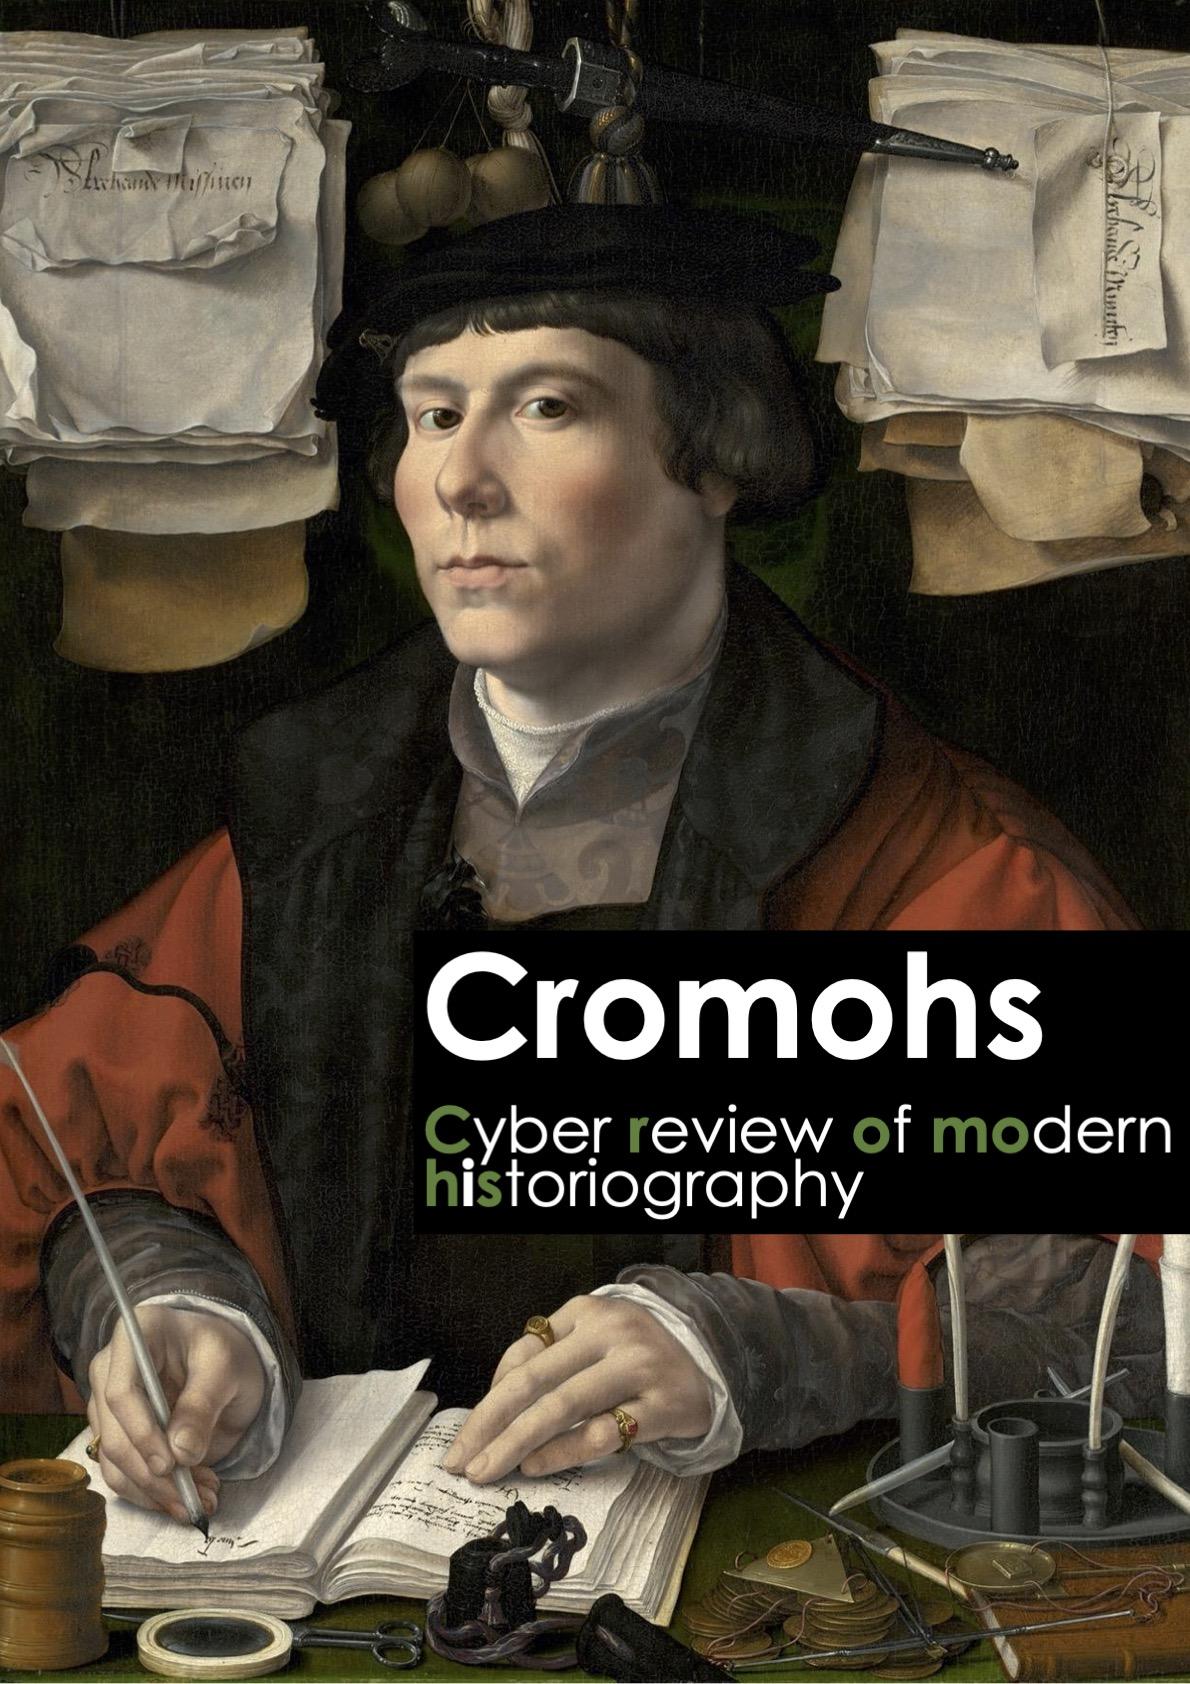 Cover image Cromohs 23, 2020, background: Jan Gossaert, Portrait of a Merchant, ca. 1530, Ailsa Mellon Bruce Fund, National Gallery of Art. Open access image